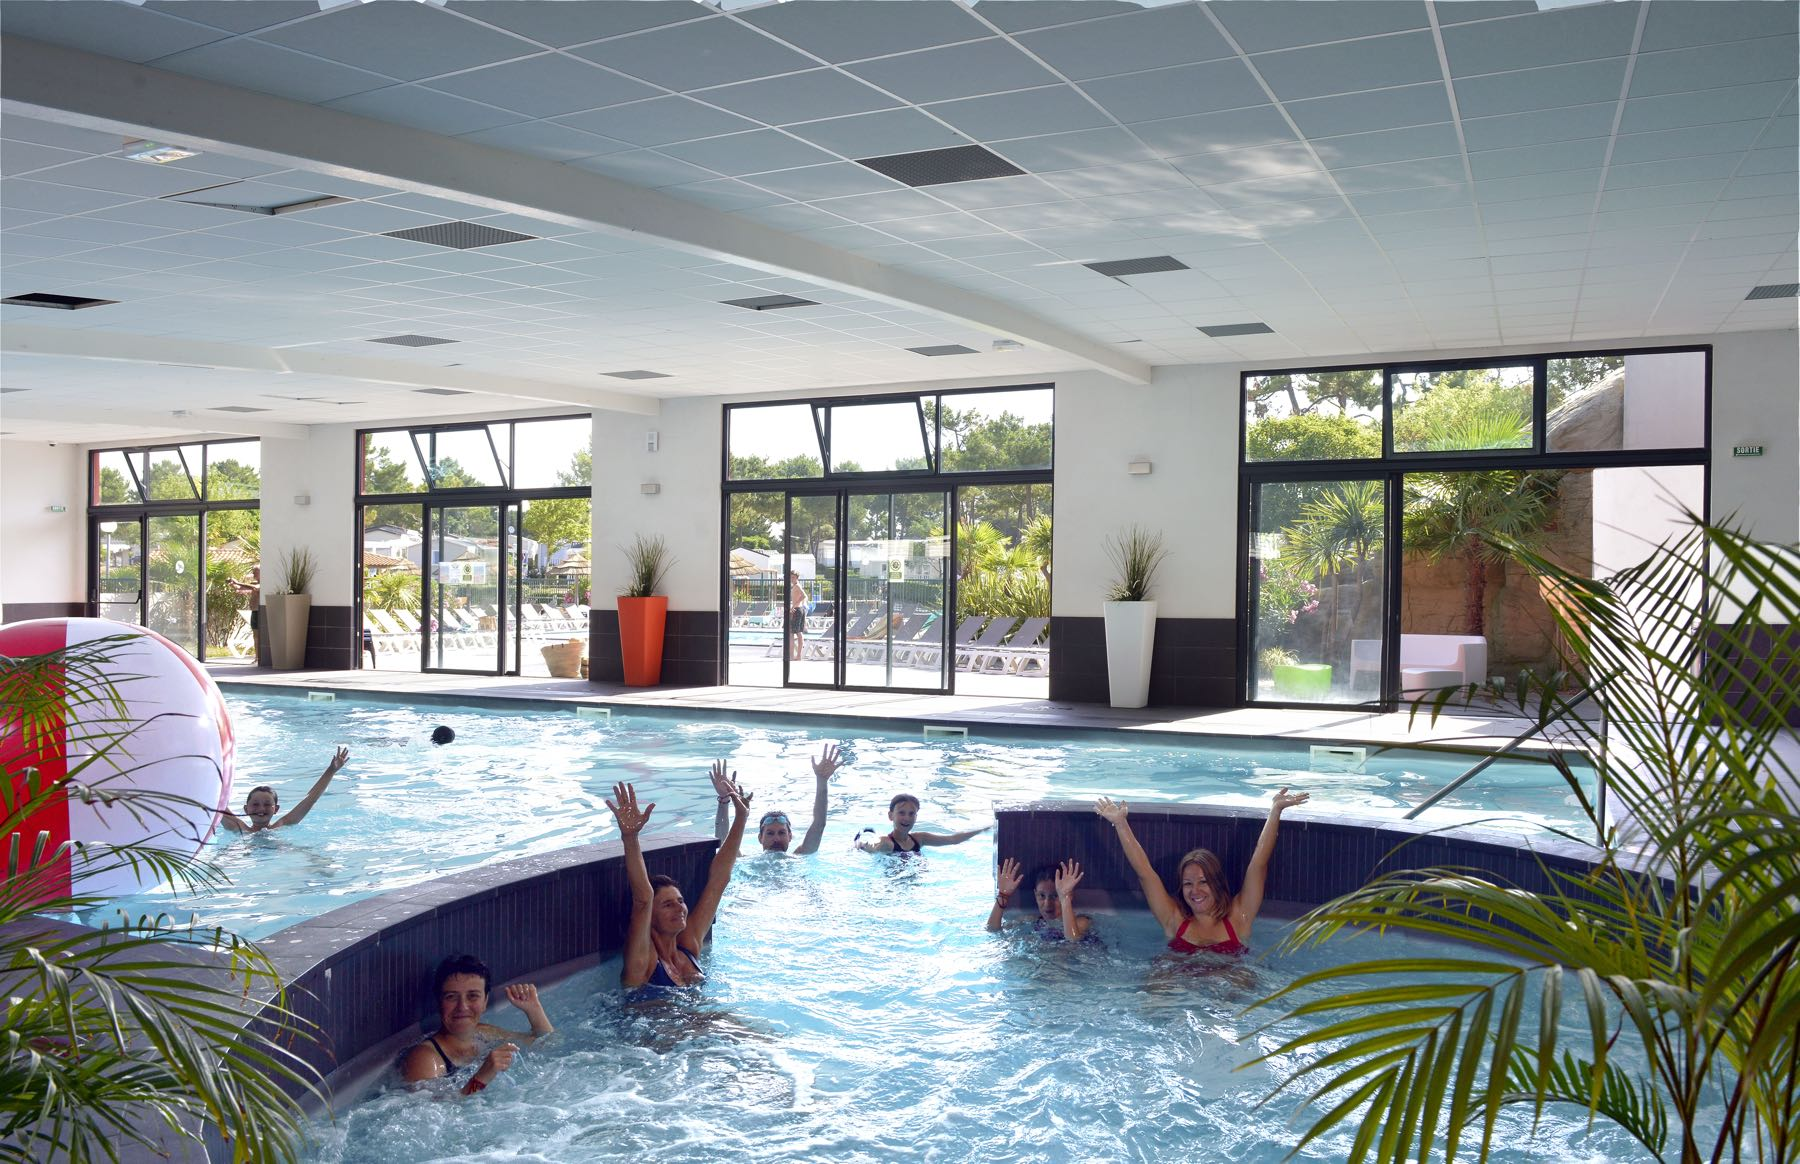 camping-vendee-piscine-interieure-chauffee-saint-jean-de-monts-Le-Tropicana